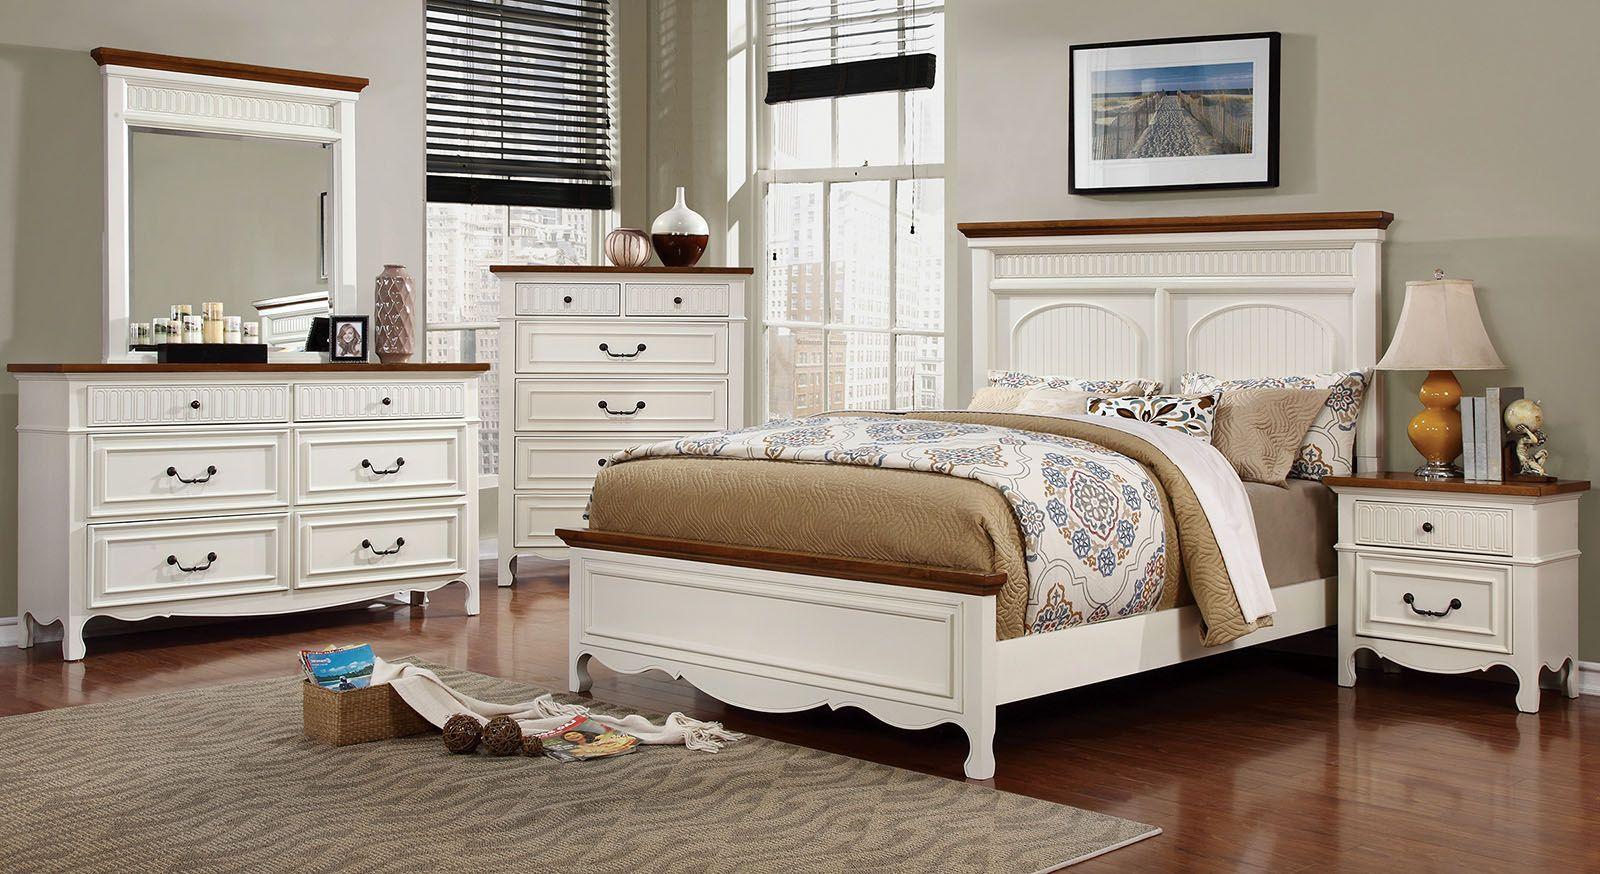 Galesburg White and Oak Bedroom Set